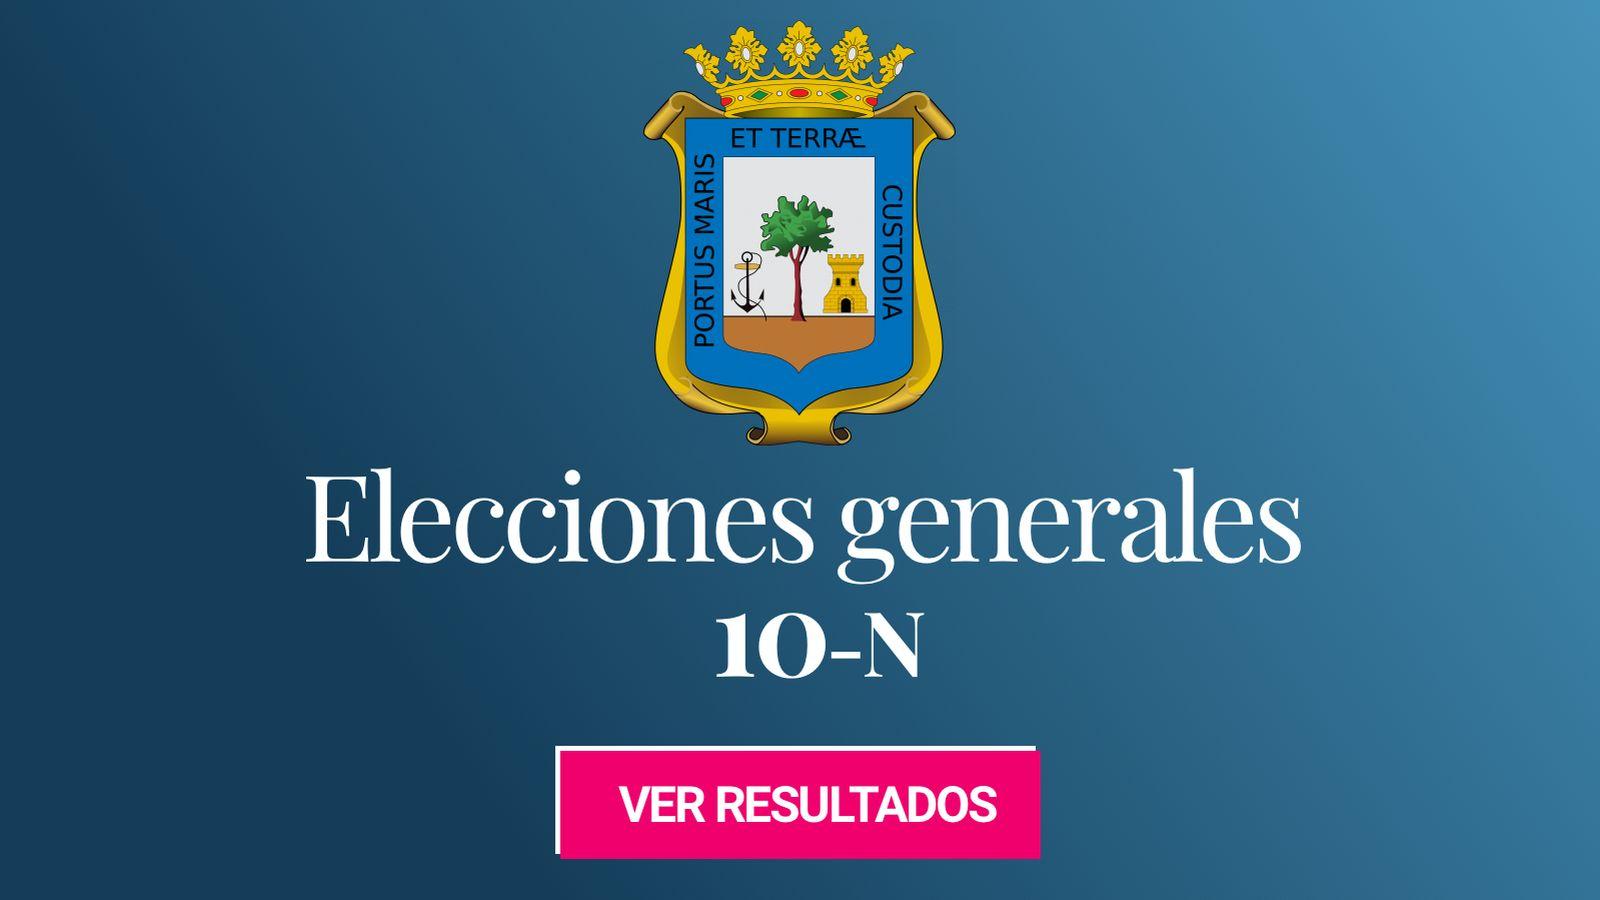 Foto: Elecciones generales 2019 en Huelva. (C.C./EC)